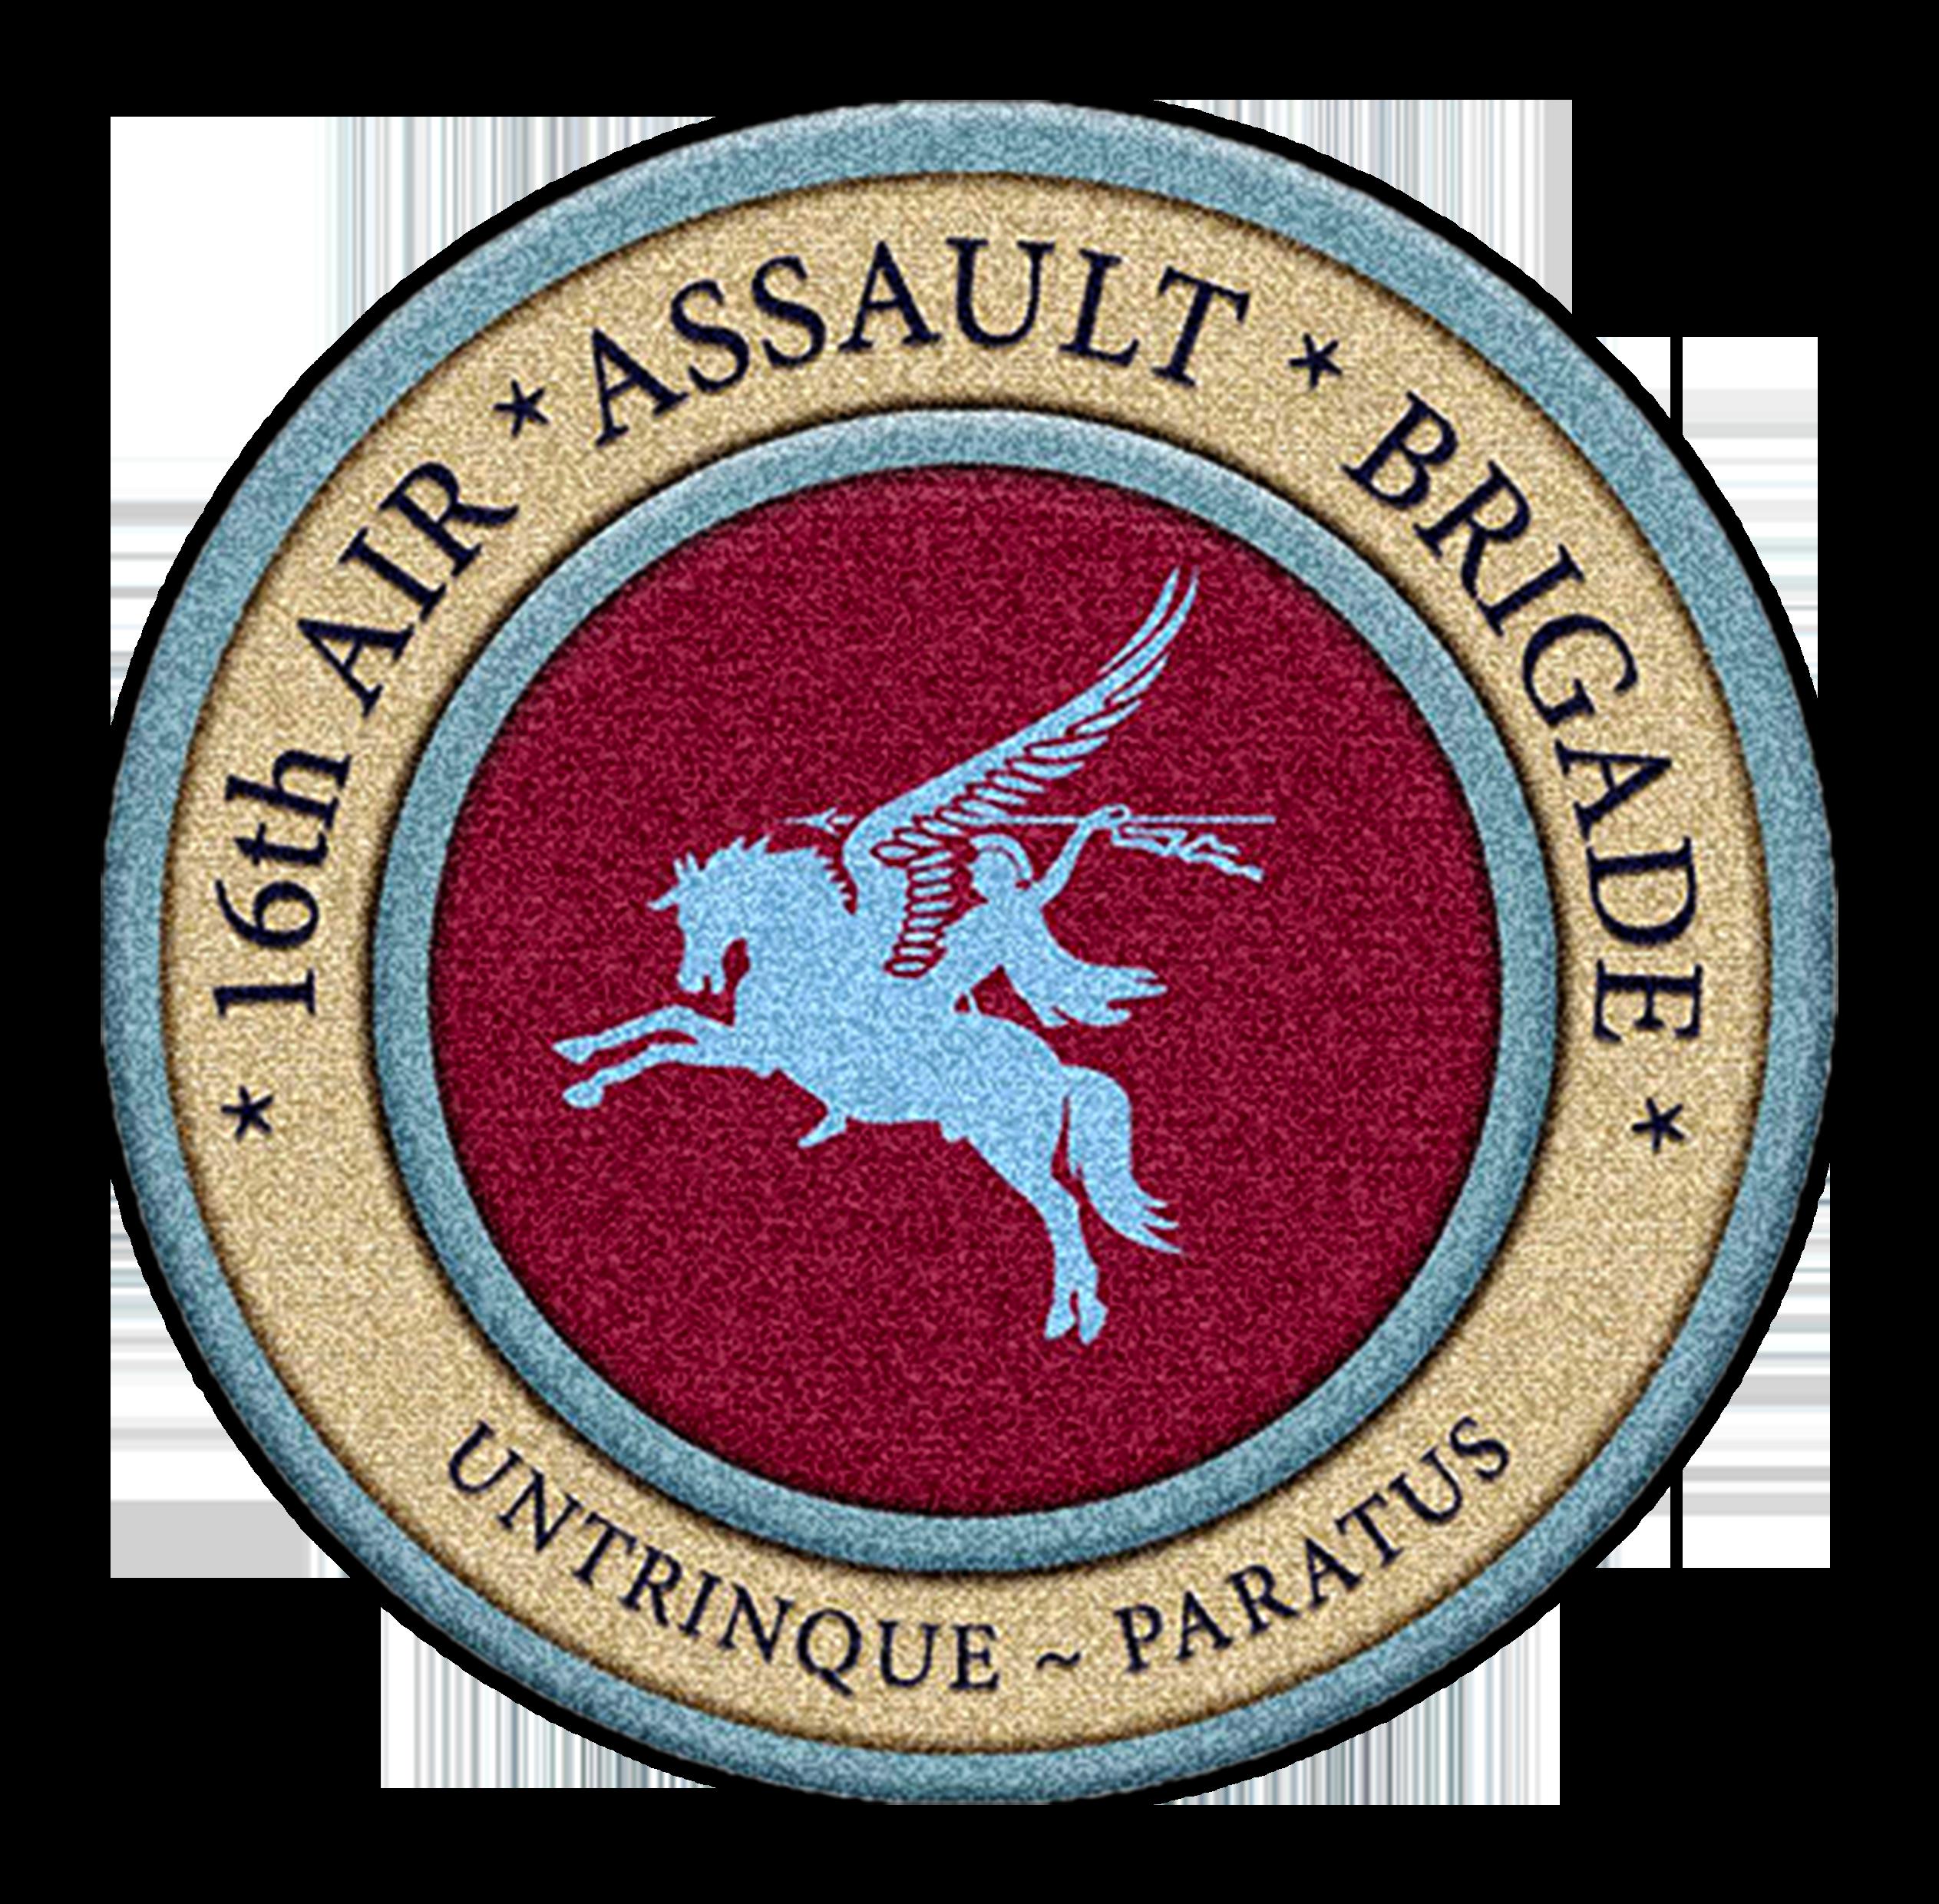 16 Brigada de Asalto Aereo (16AAB)